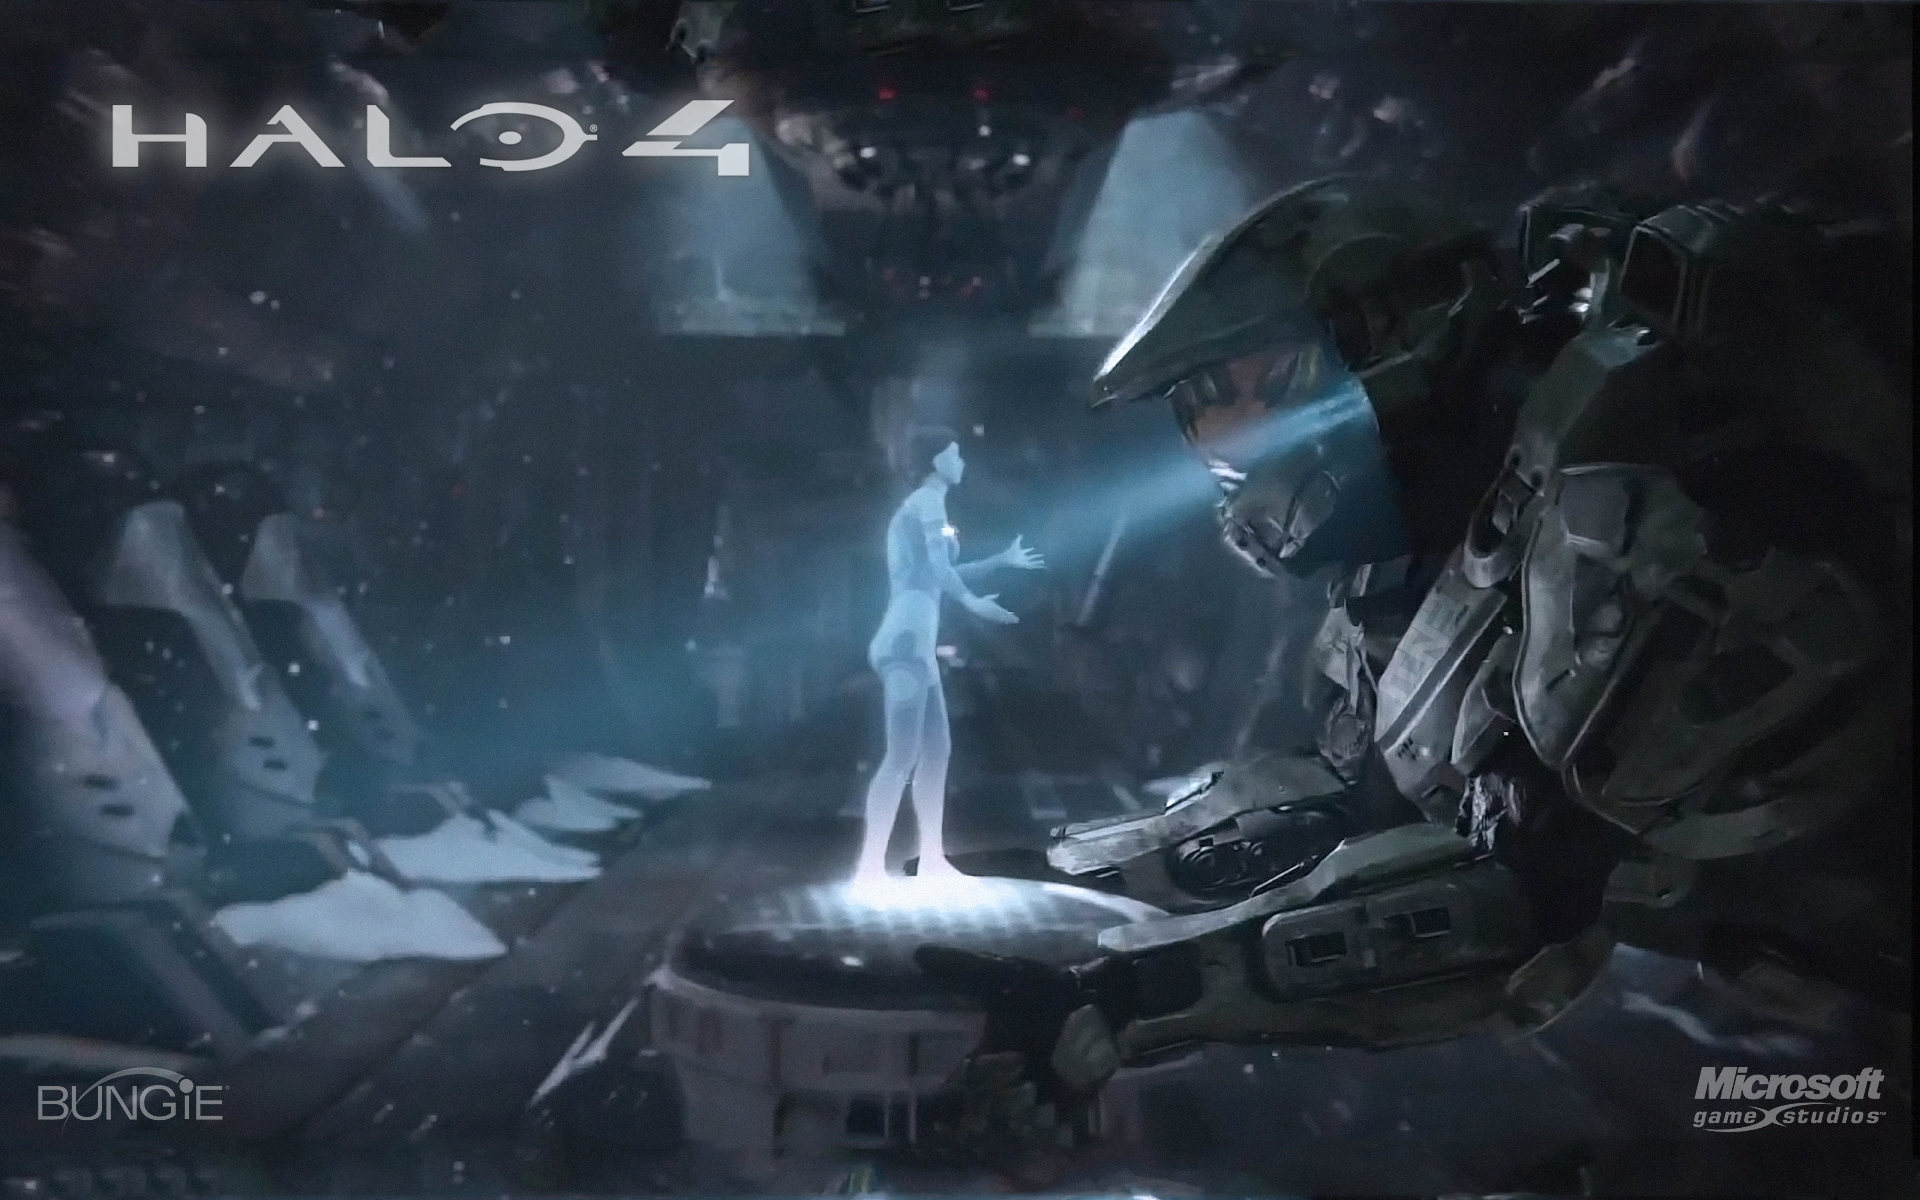 49 Halo 2 Anniversary Wallpaper Hd On Wallpapersafari